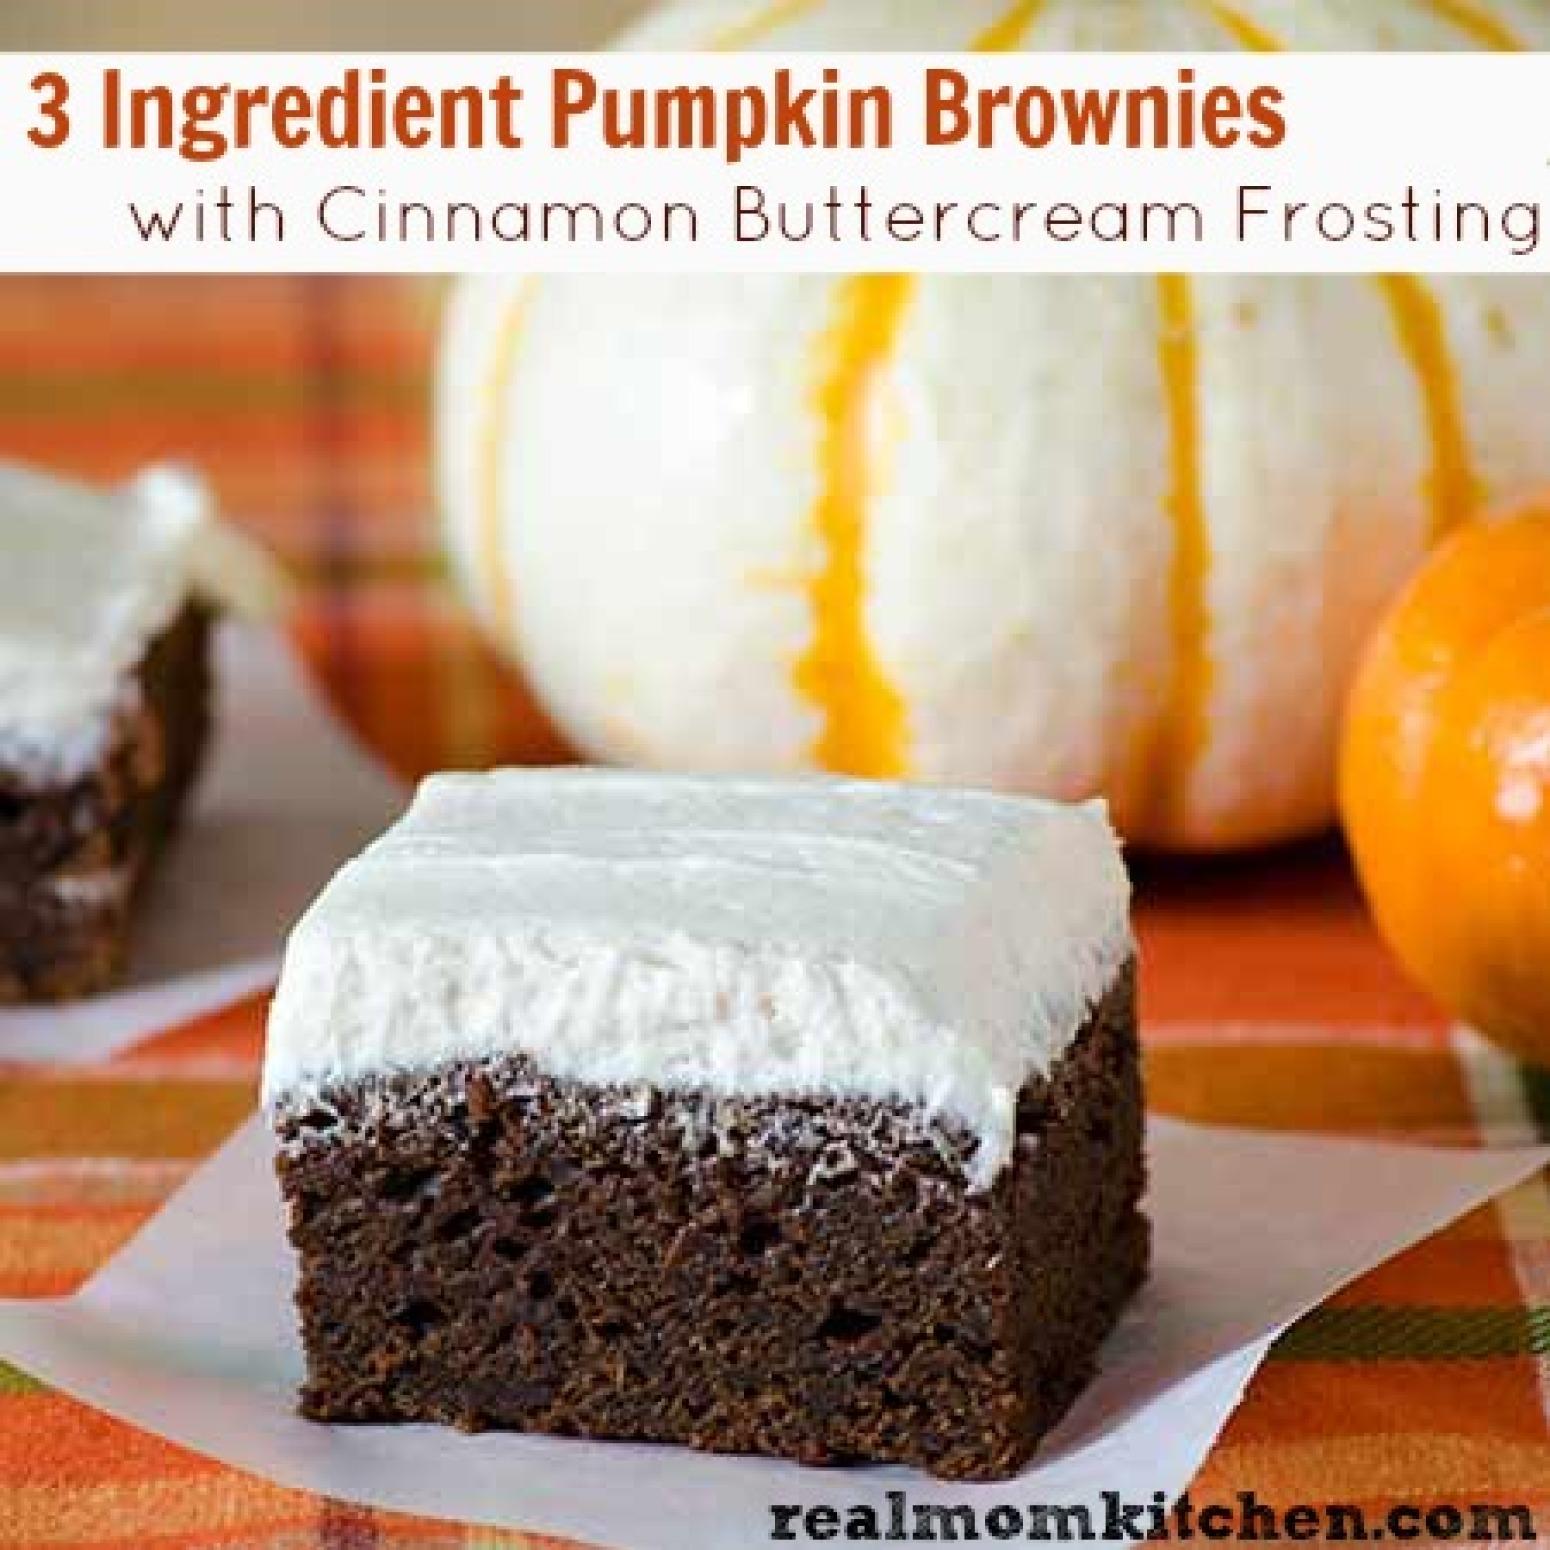 ... Ingredient Pumpkin Brownies with Cinnamon Buttercream Frosting Recipe